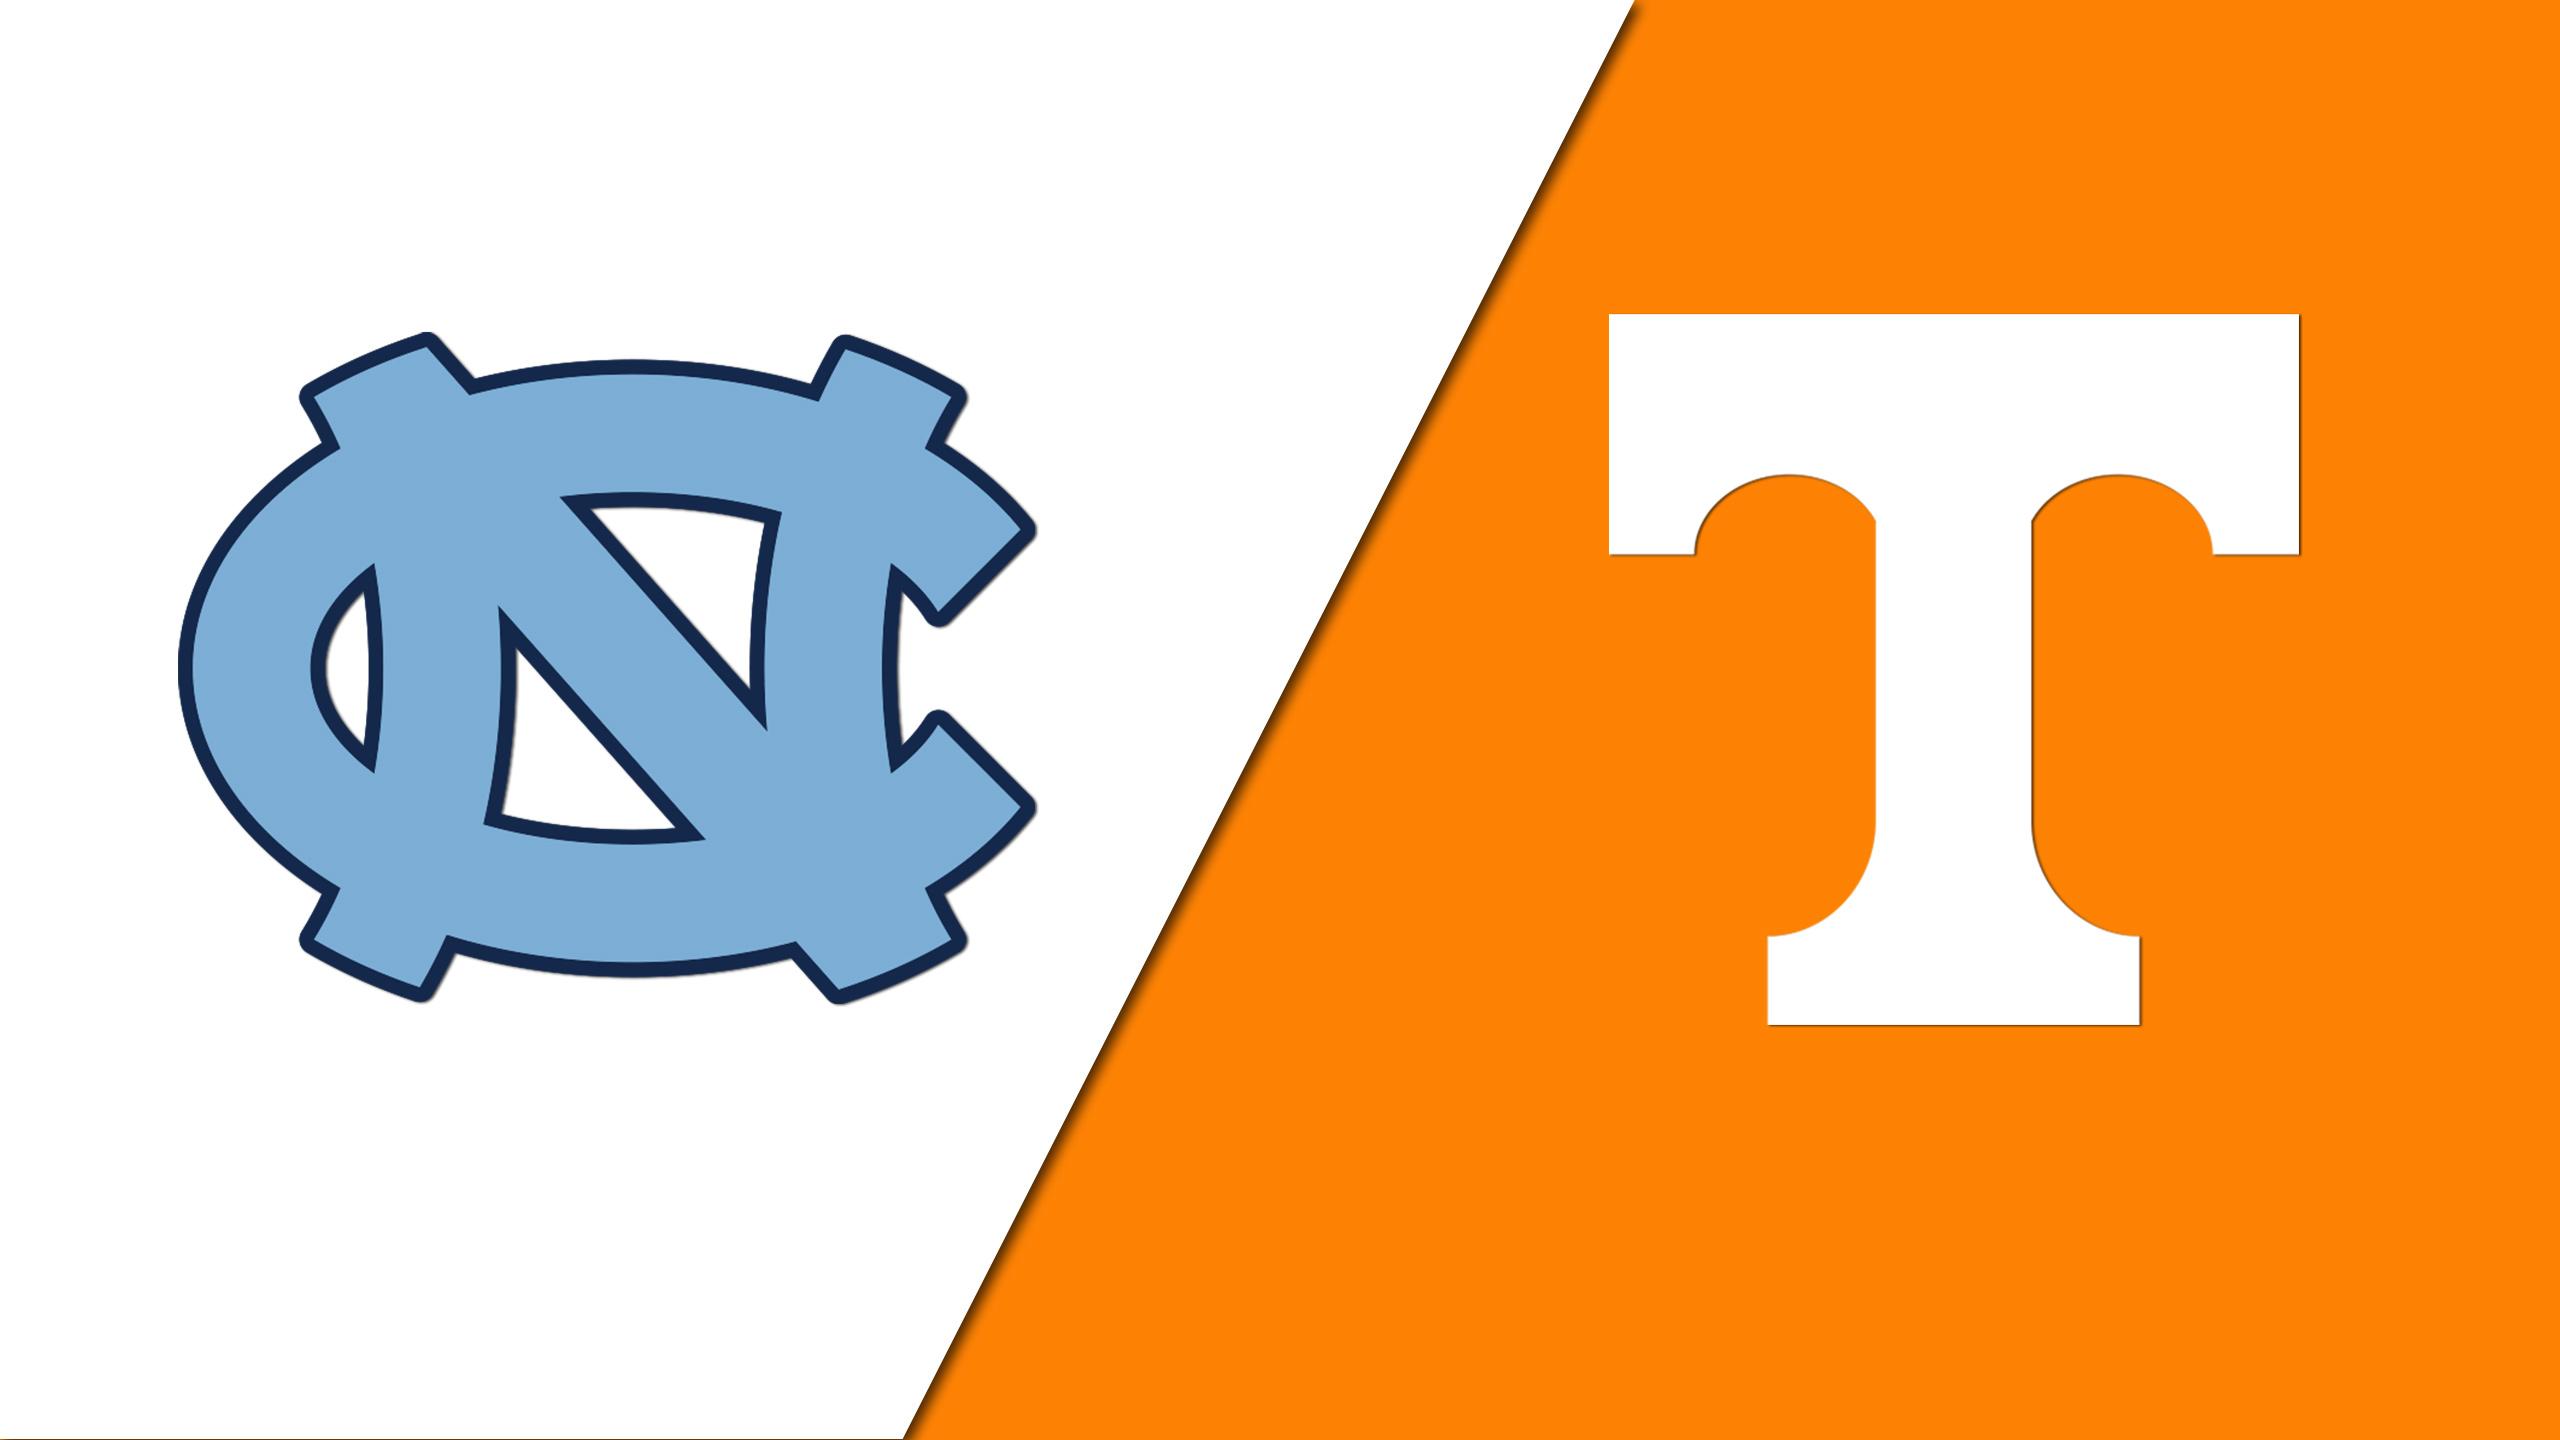 North Carolina vs. Tennessee (Site 14 / Game 7)